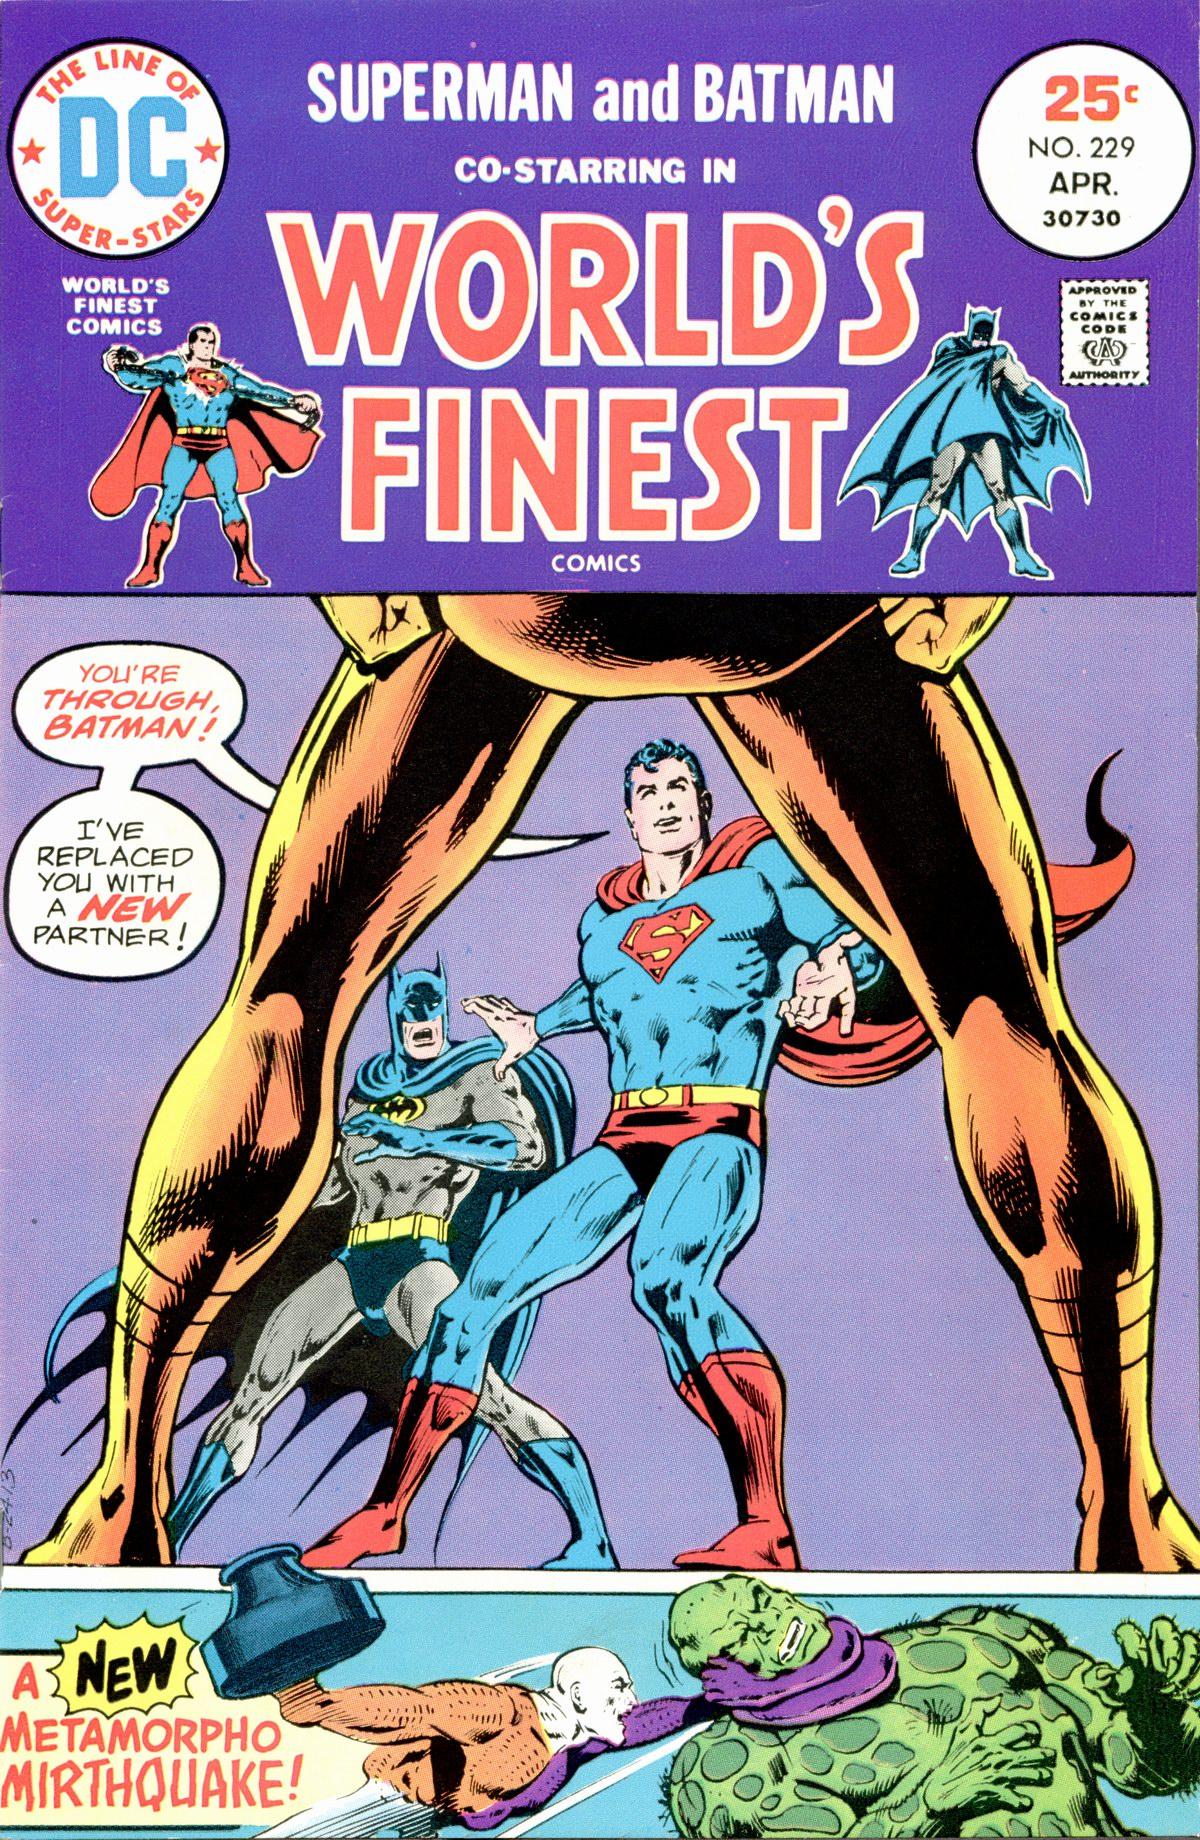 Read online World's Finest Comics comic -  Issue #229 - 1